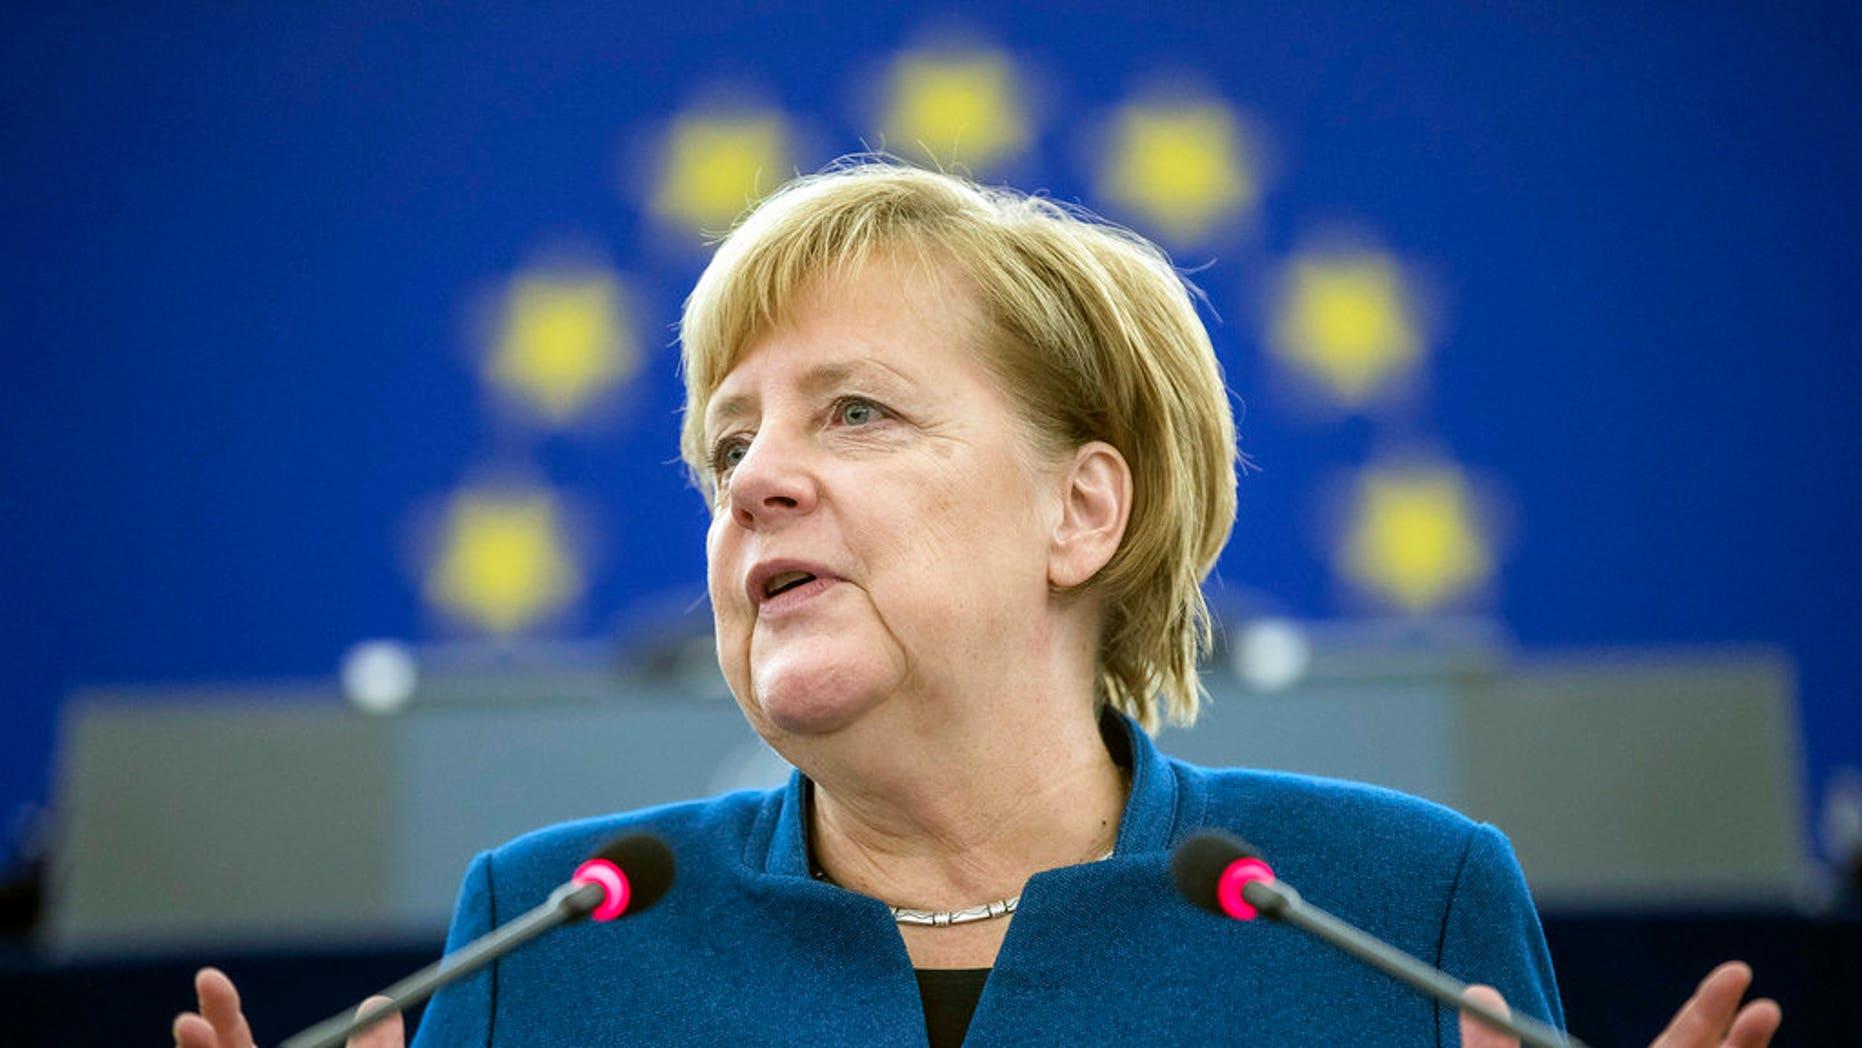 German Chancellor Angela Merkel addresses the European Parliament on Tuesday.